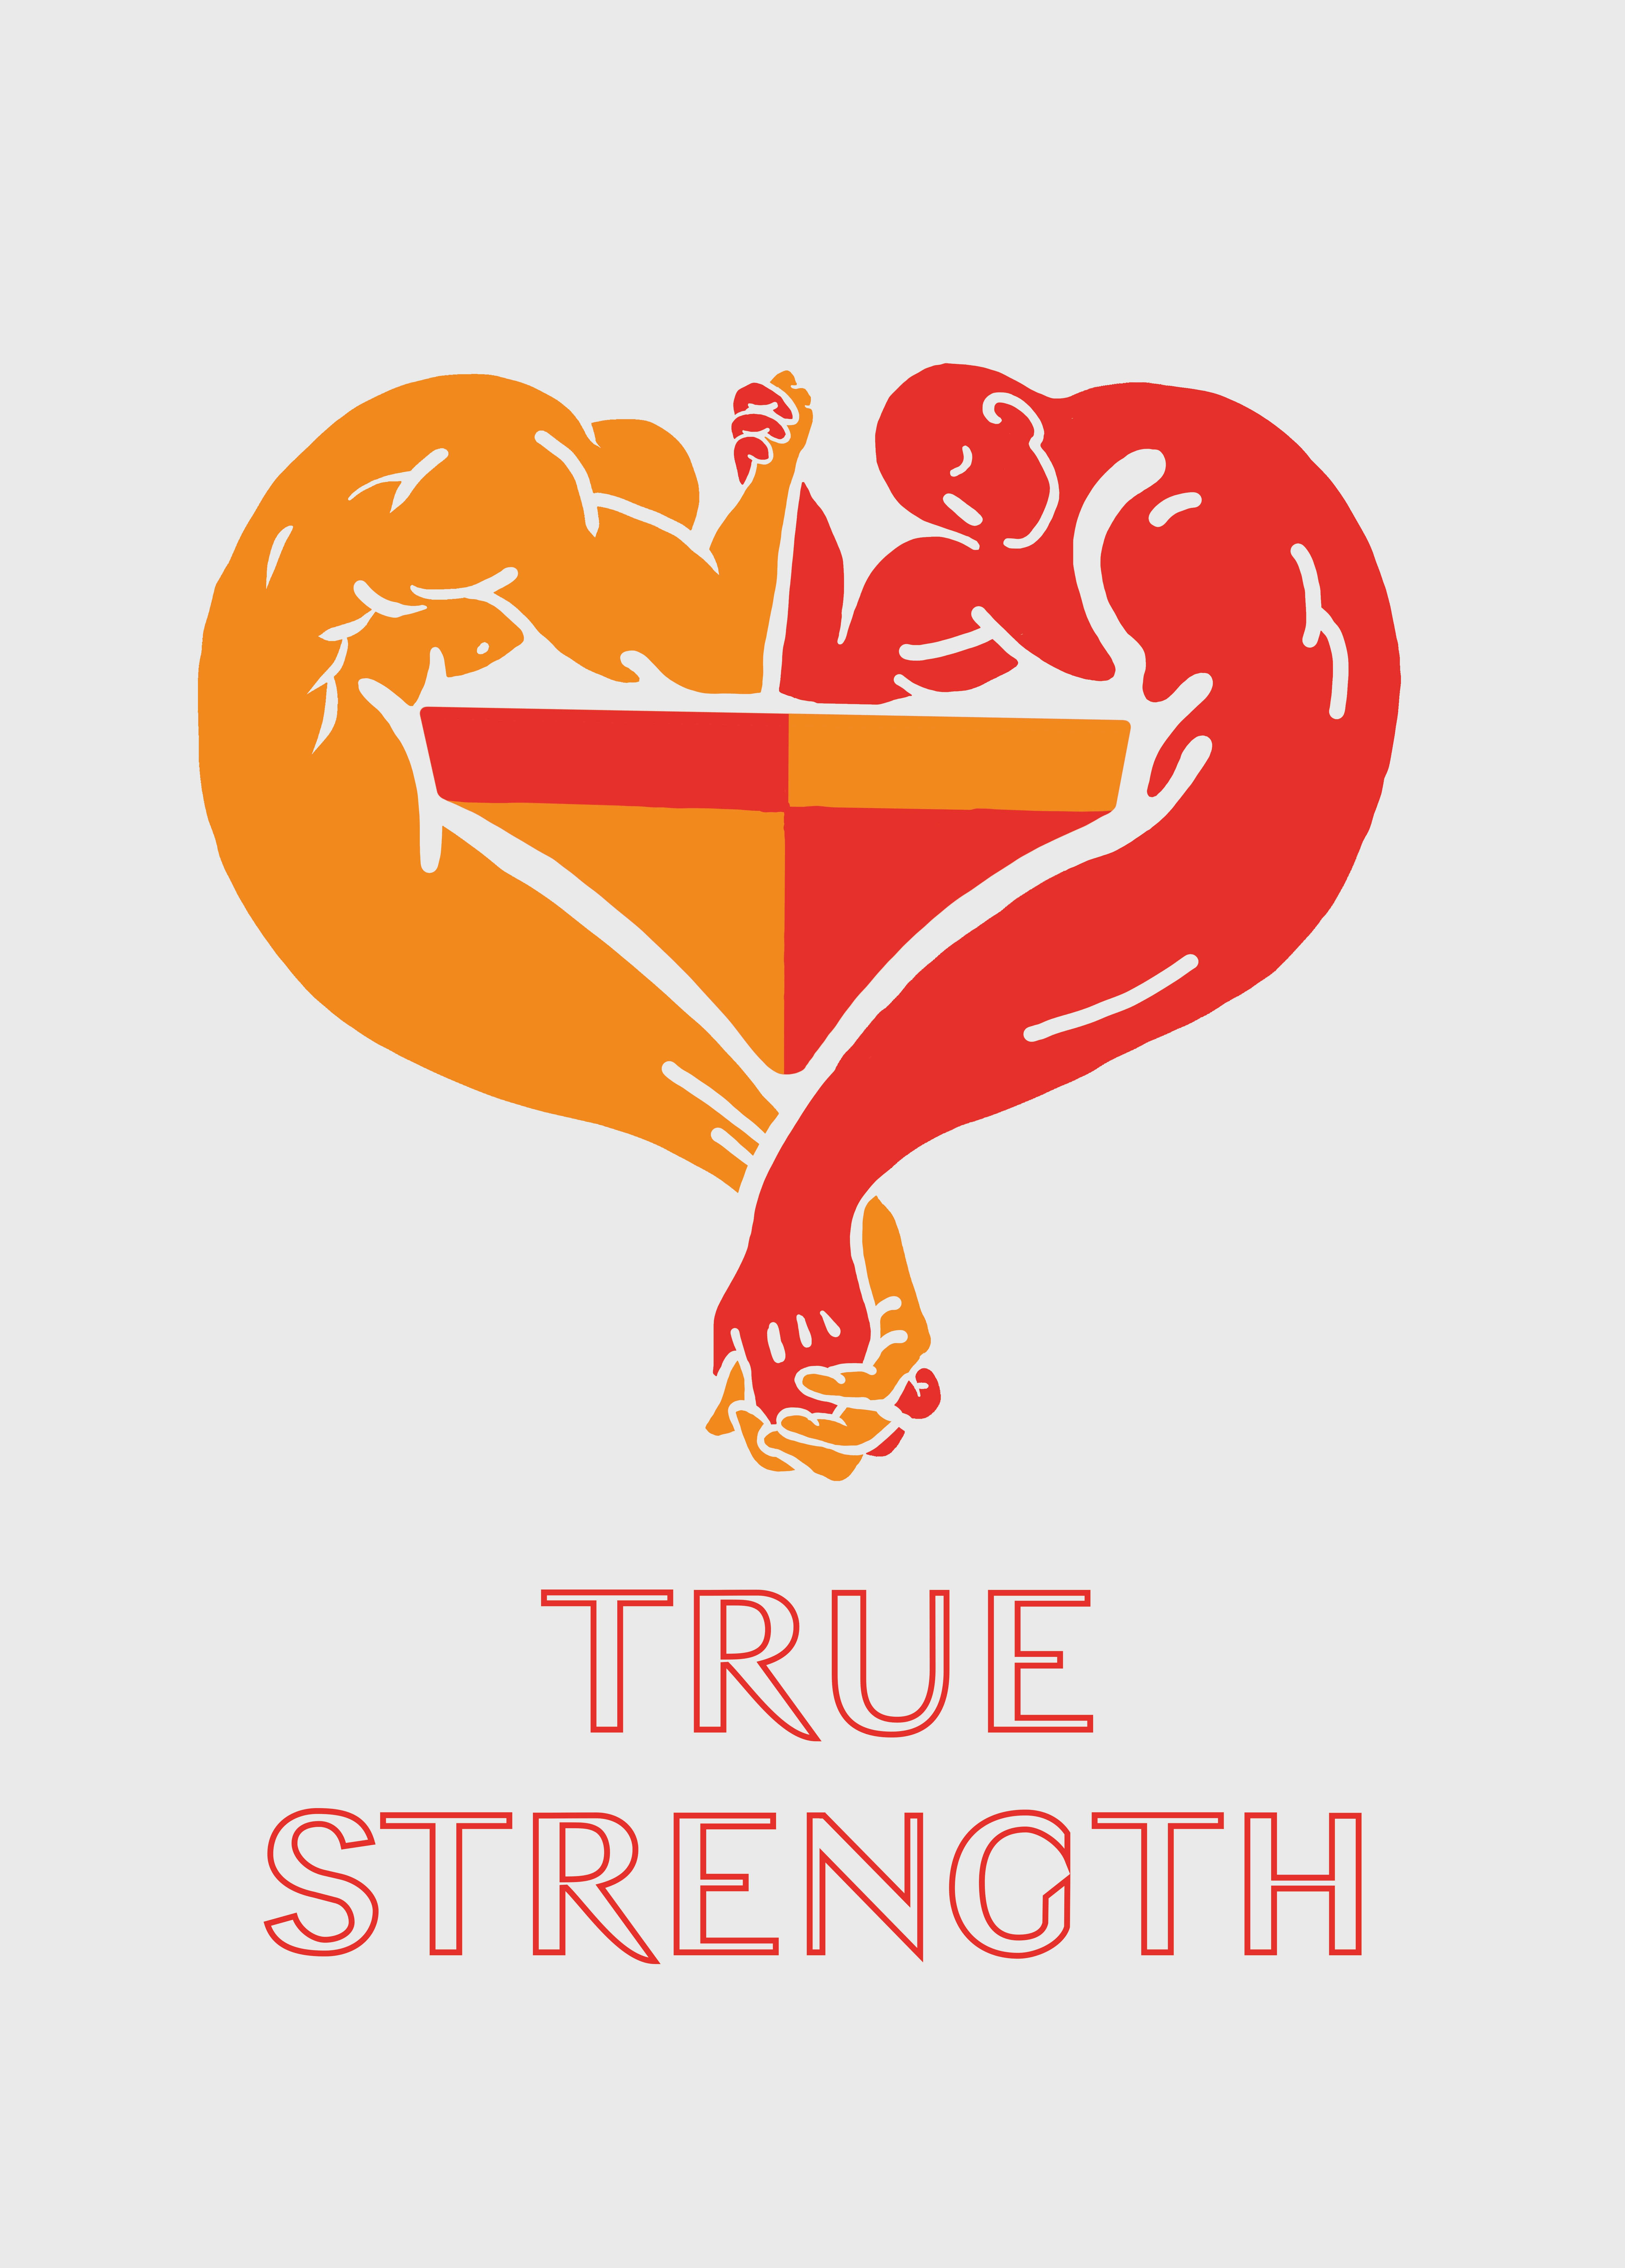 True Strength main image